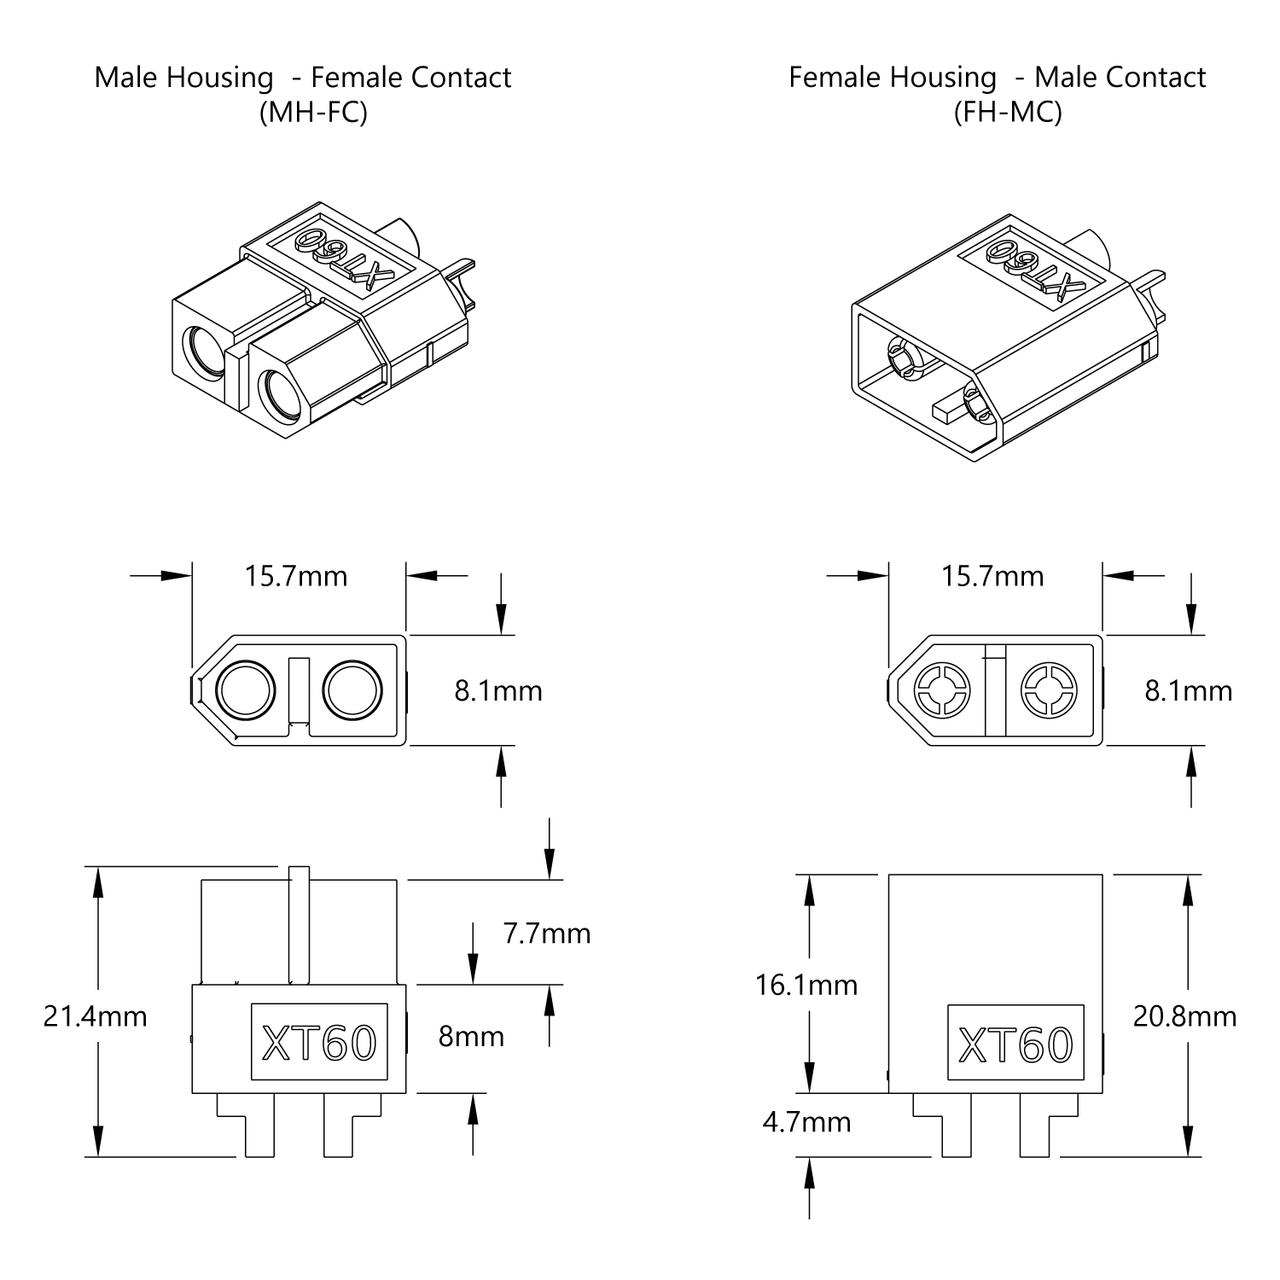 Xt60 Connector Pack Mh Fc X 5 Fh Mc X 5 Gobilda